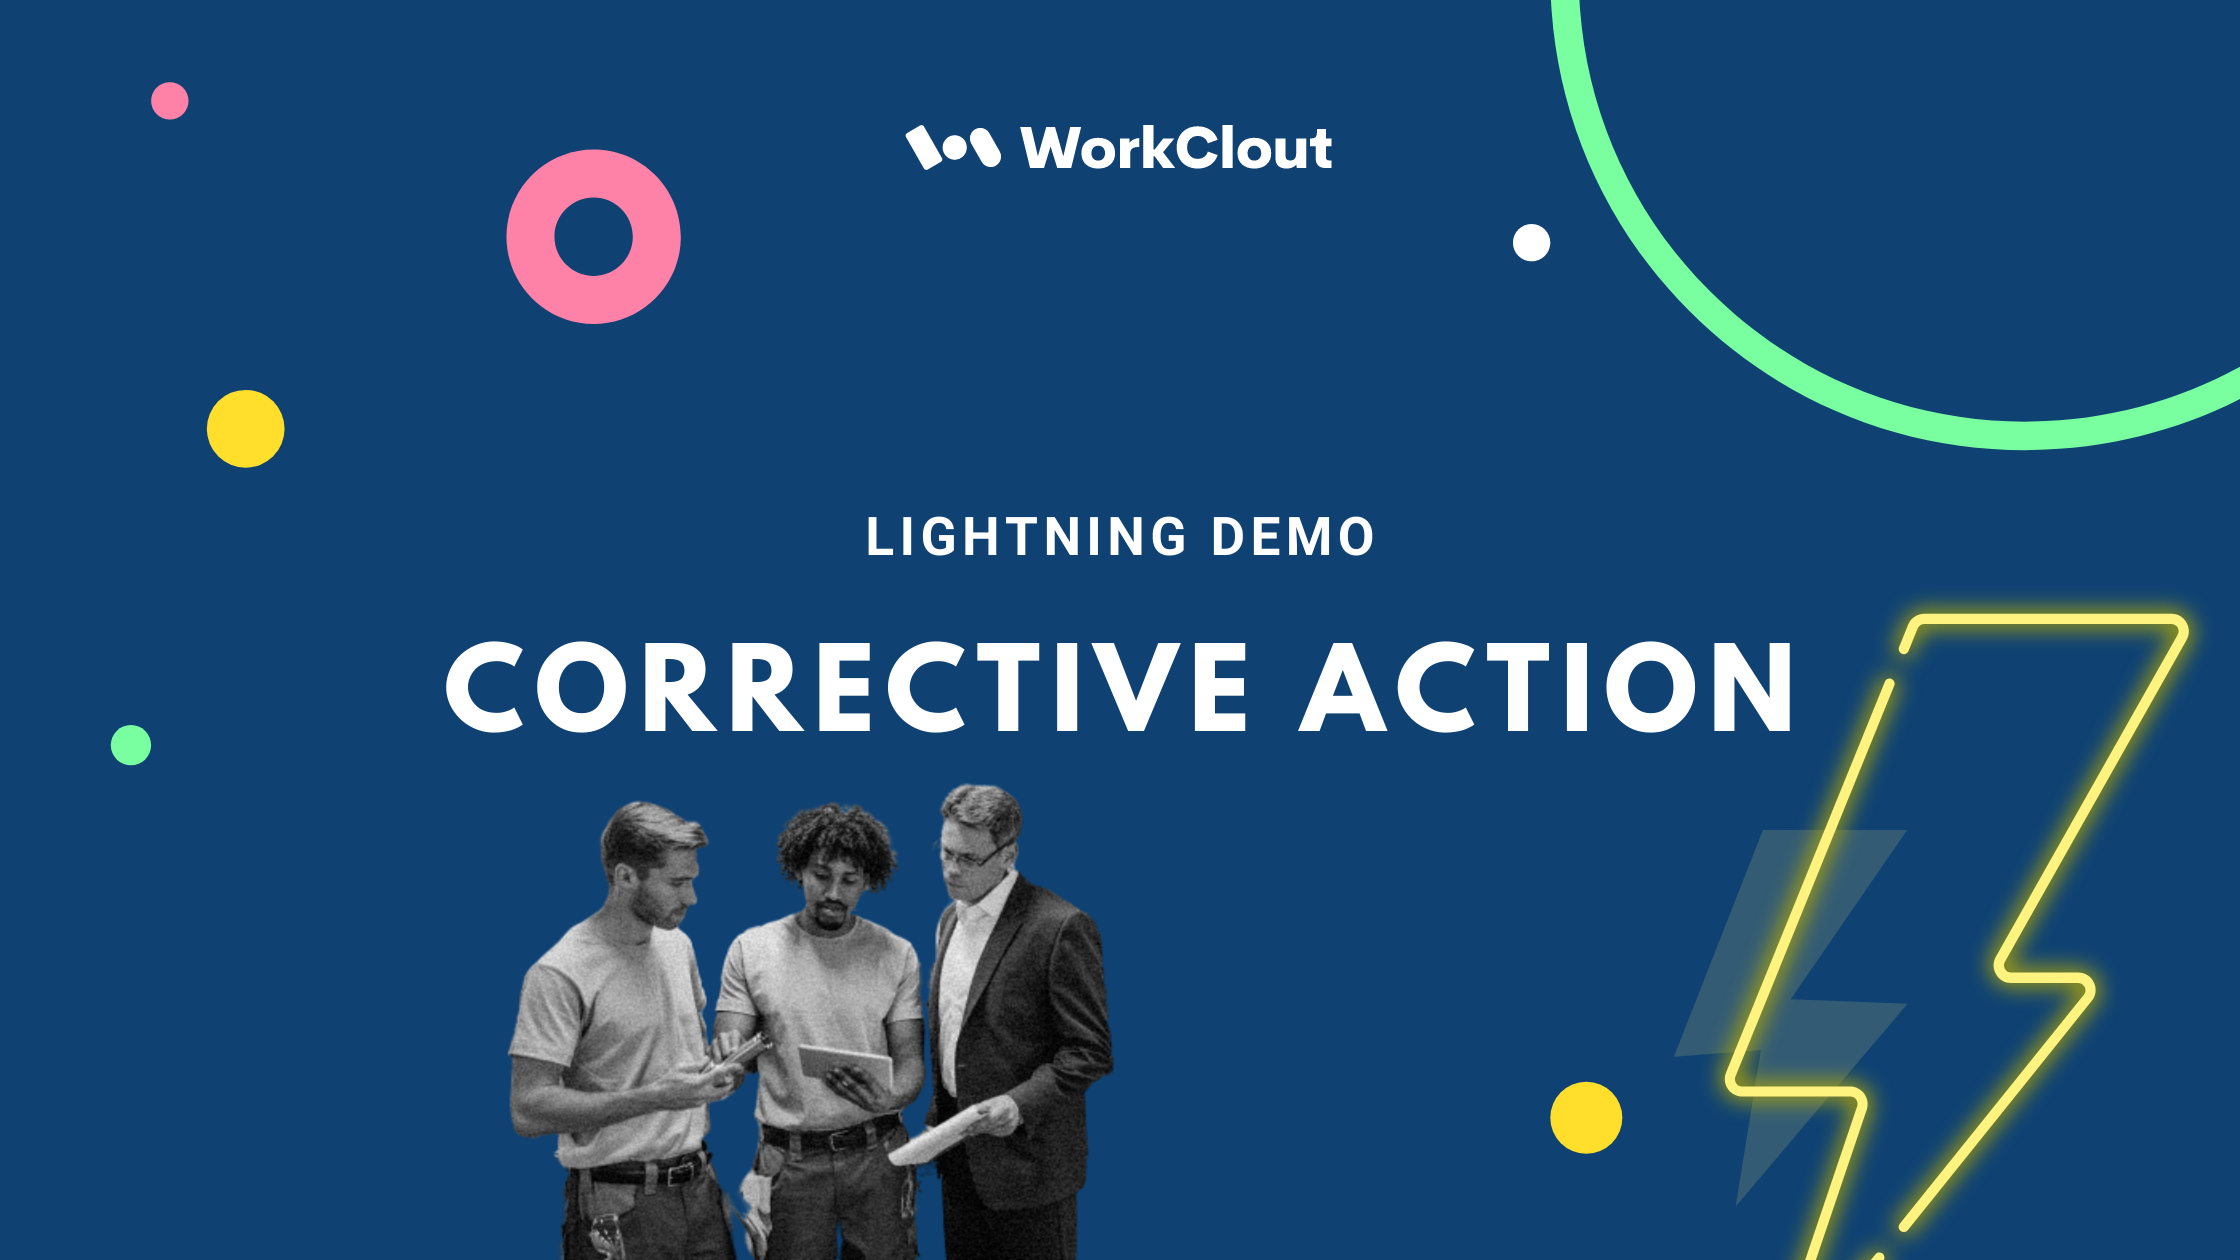 Lightning Demo - Corrective Action